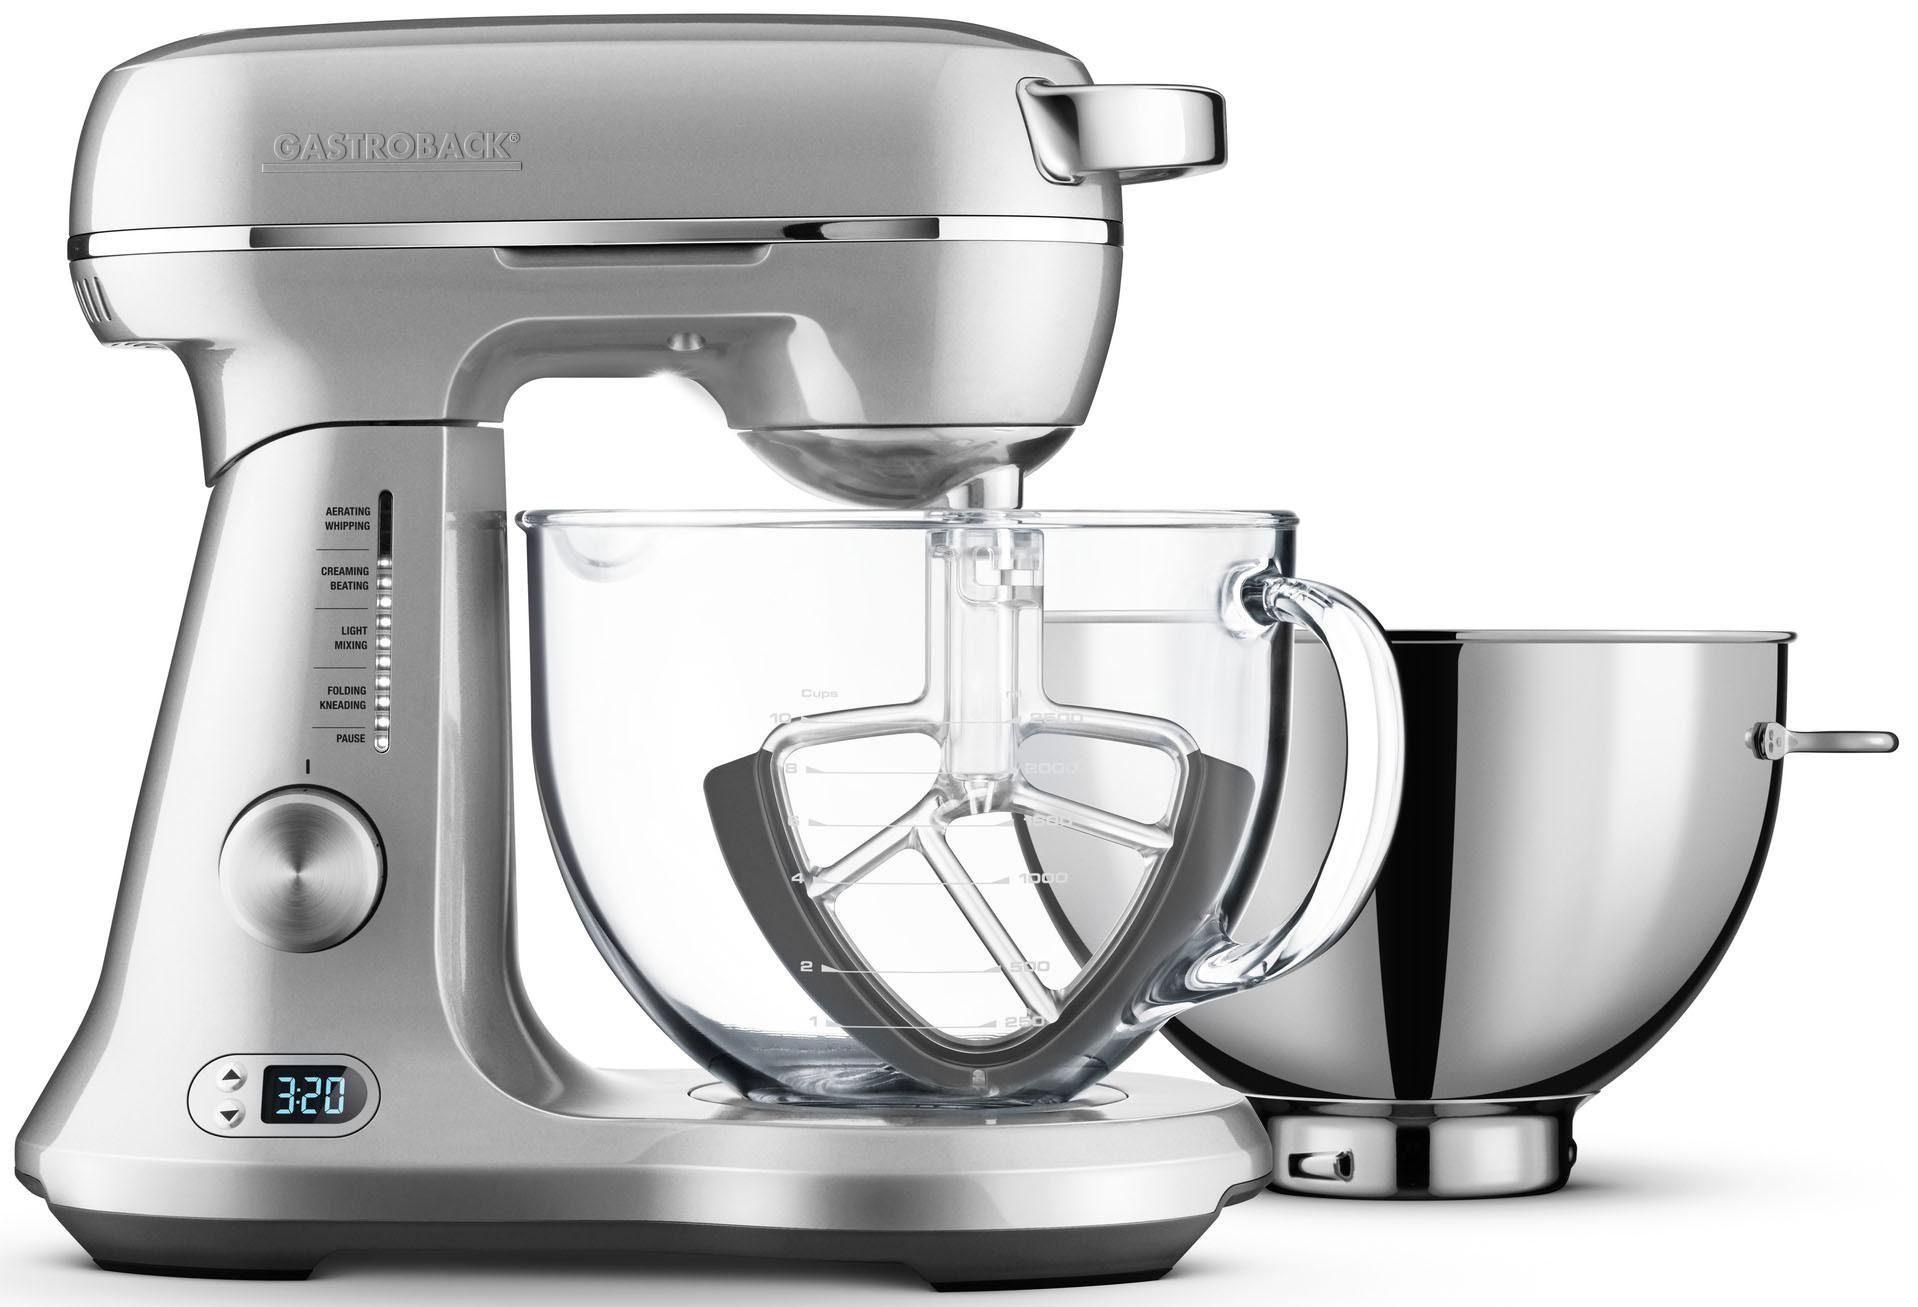 Gastroback Küchenmaschine 40989 Design Advanced Pro Duo, 1200 W, 4,7 l Schüssel, Rührschüssel aus Borosilikatglas